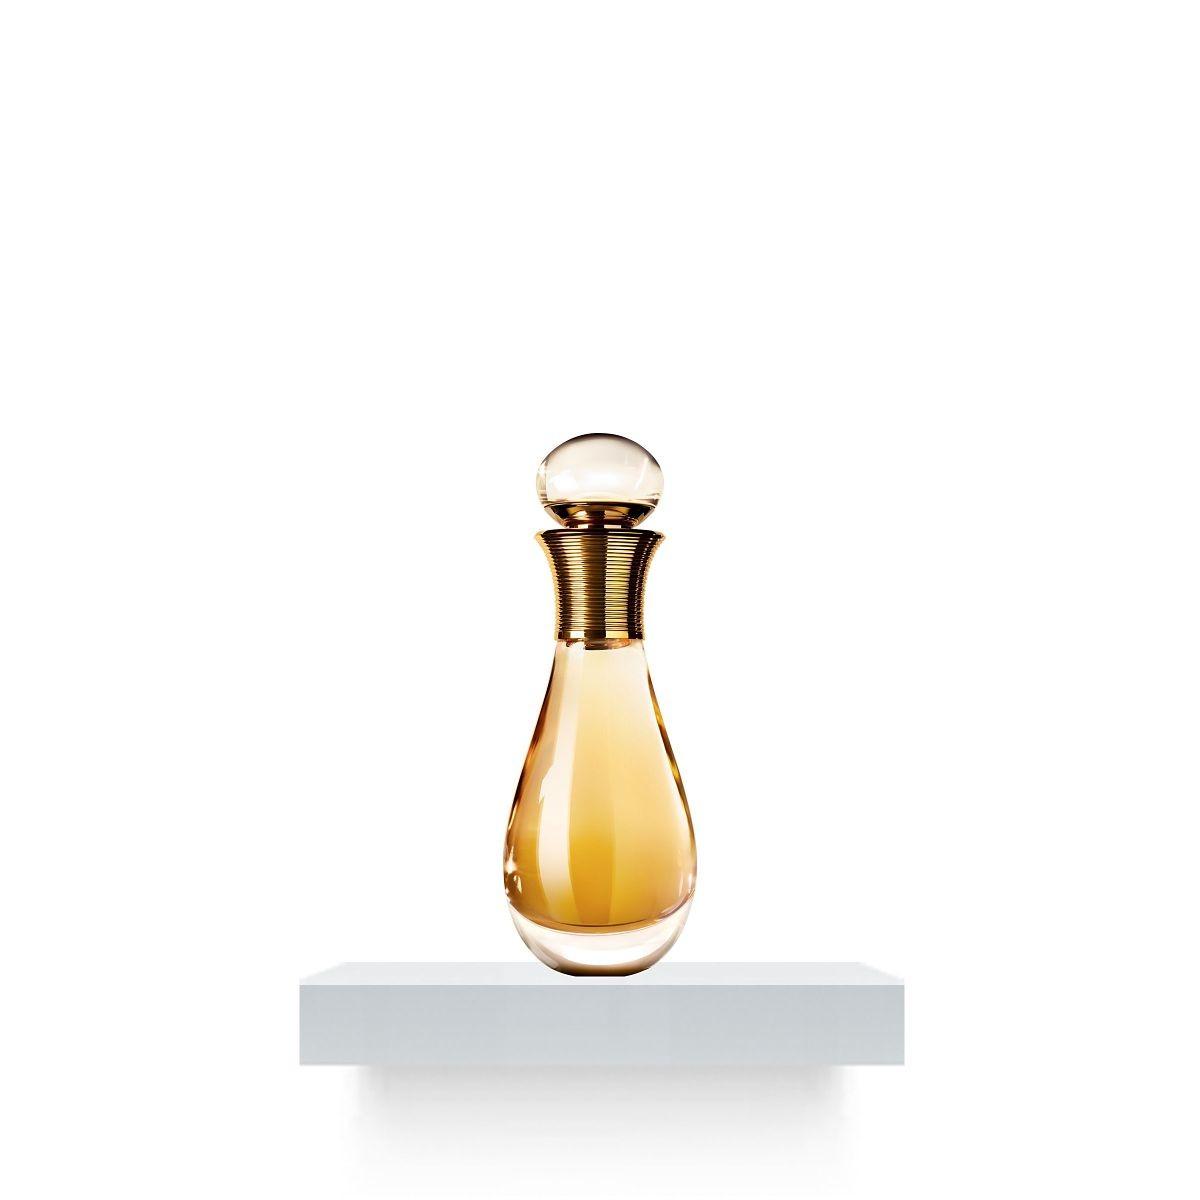 dior j 39 adore touche de parfum 2015 new perfume the scented salamander perfume beauty. Black Bedroom Furniture Sets. Home Design Ideas